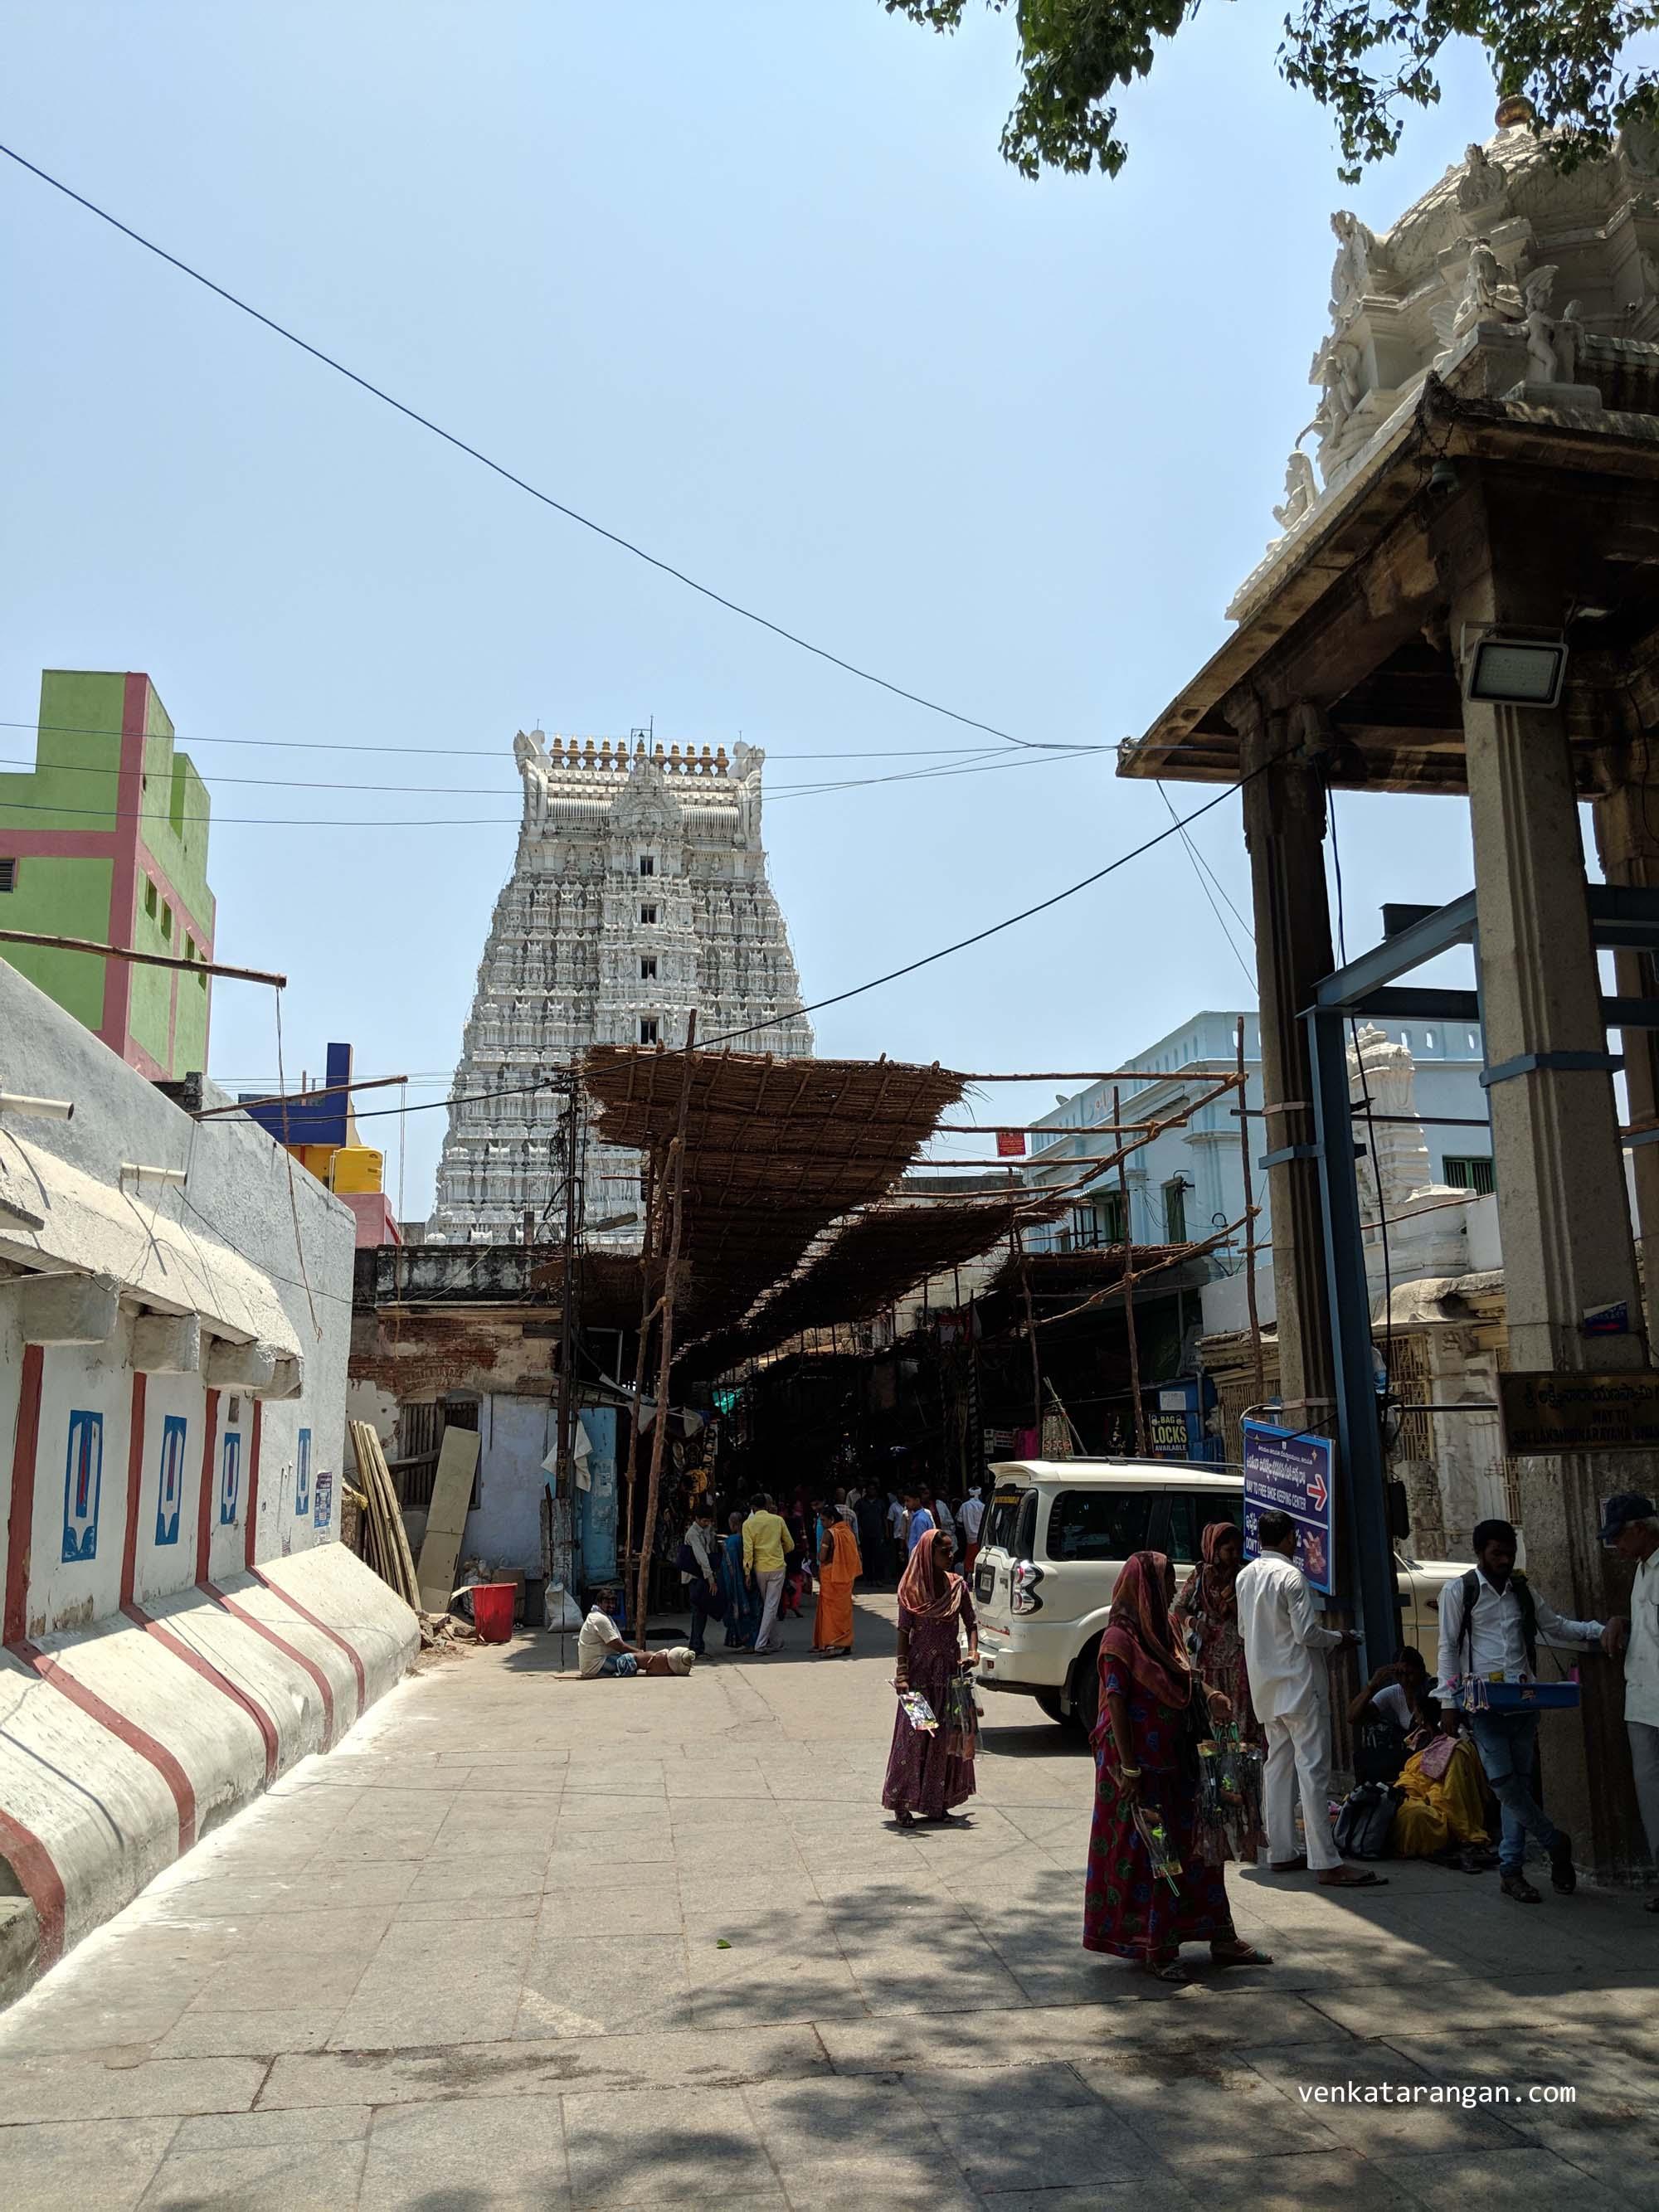 Sri Kodandaramaswamy Temple, Tirupati (திருப்பதி ஸ்ரீ கோதண்டராமர் கோயில்)